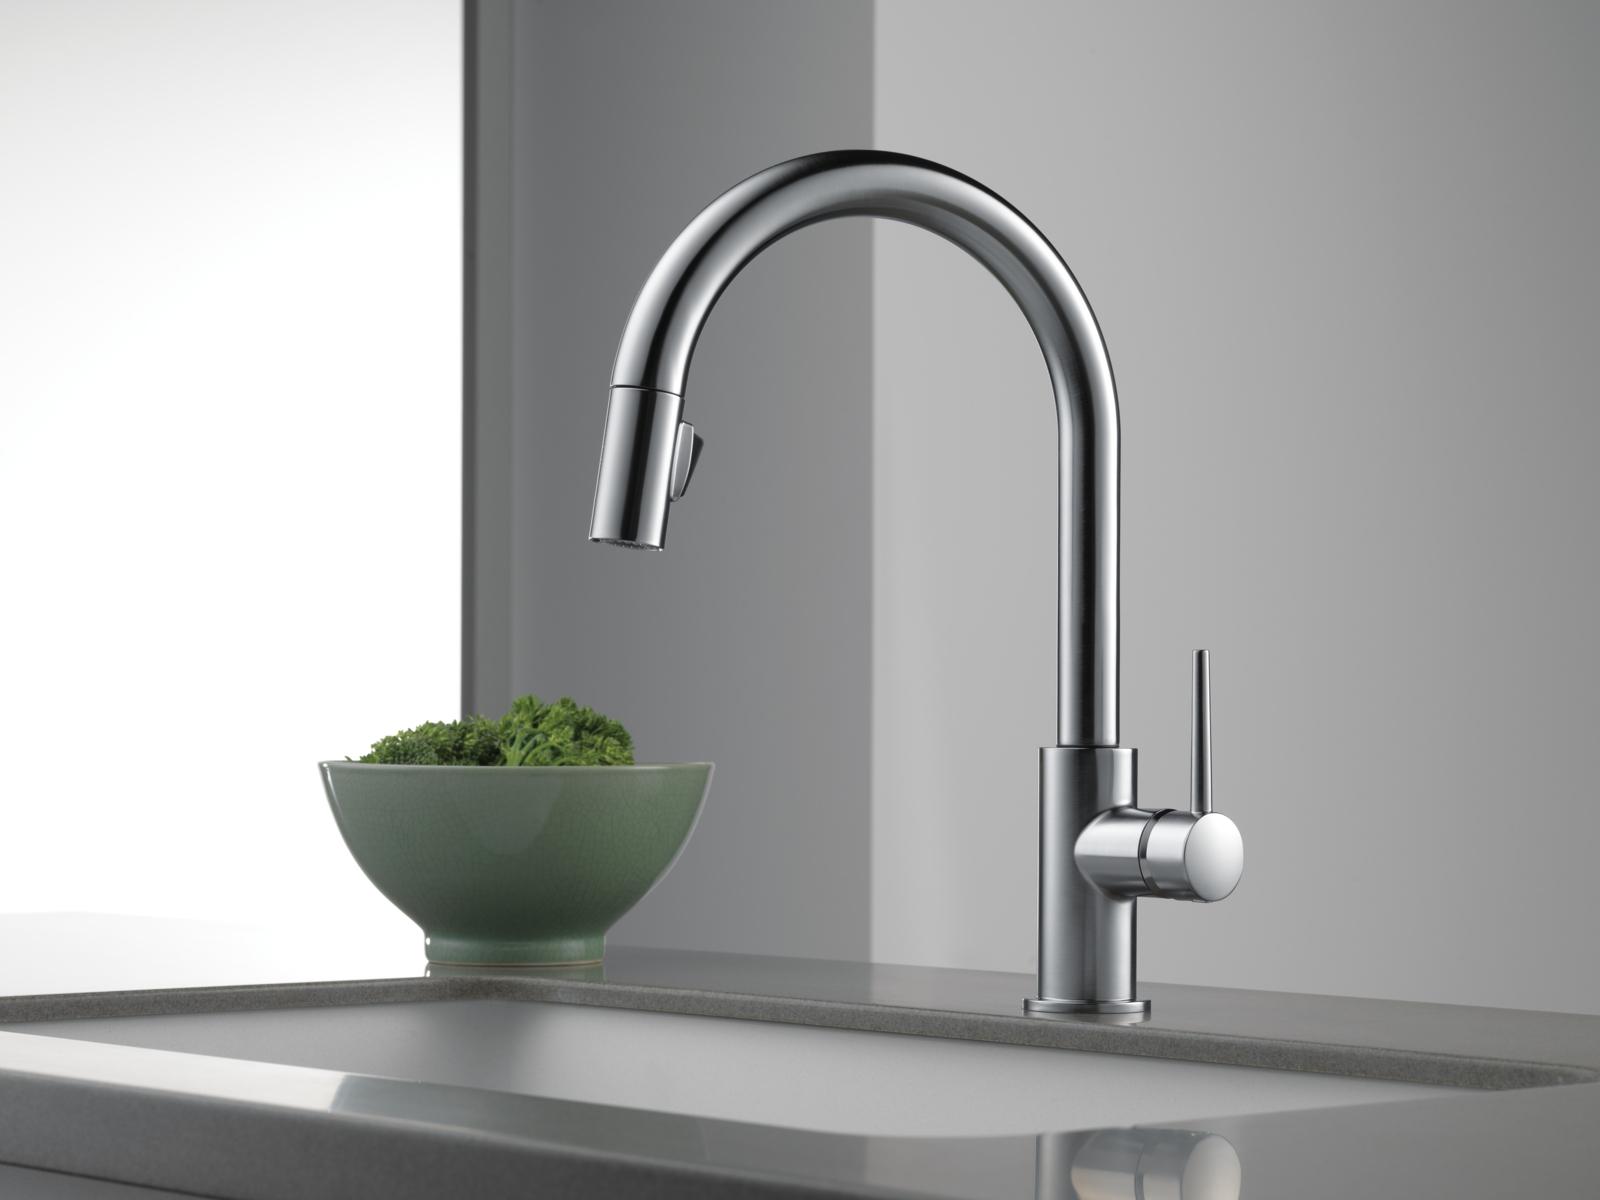 Ideas, kitchen delta touch faucet touchless 2017 with motion sensor for measurements 1600 x 1200  .